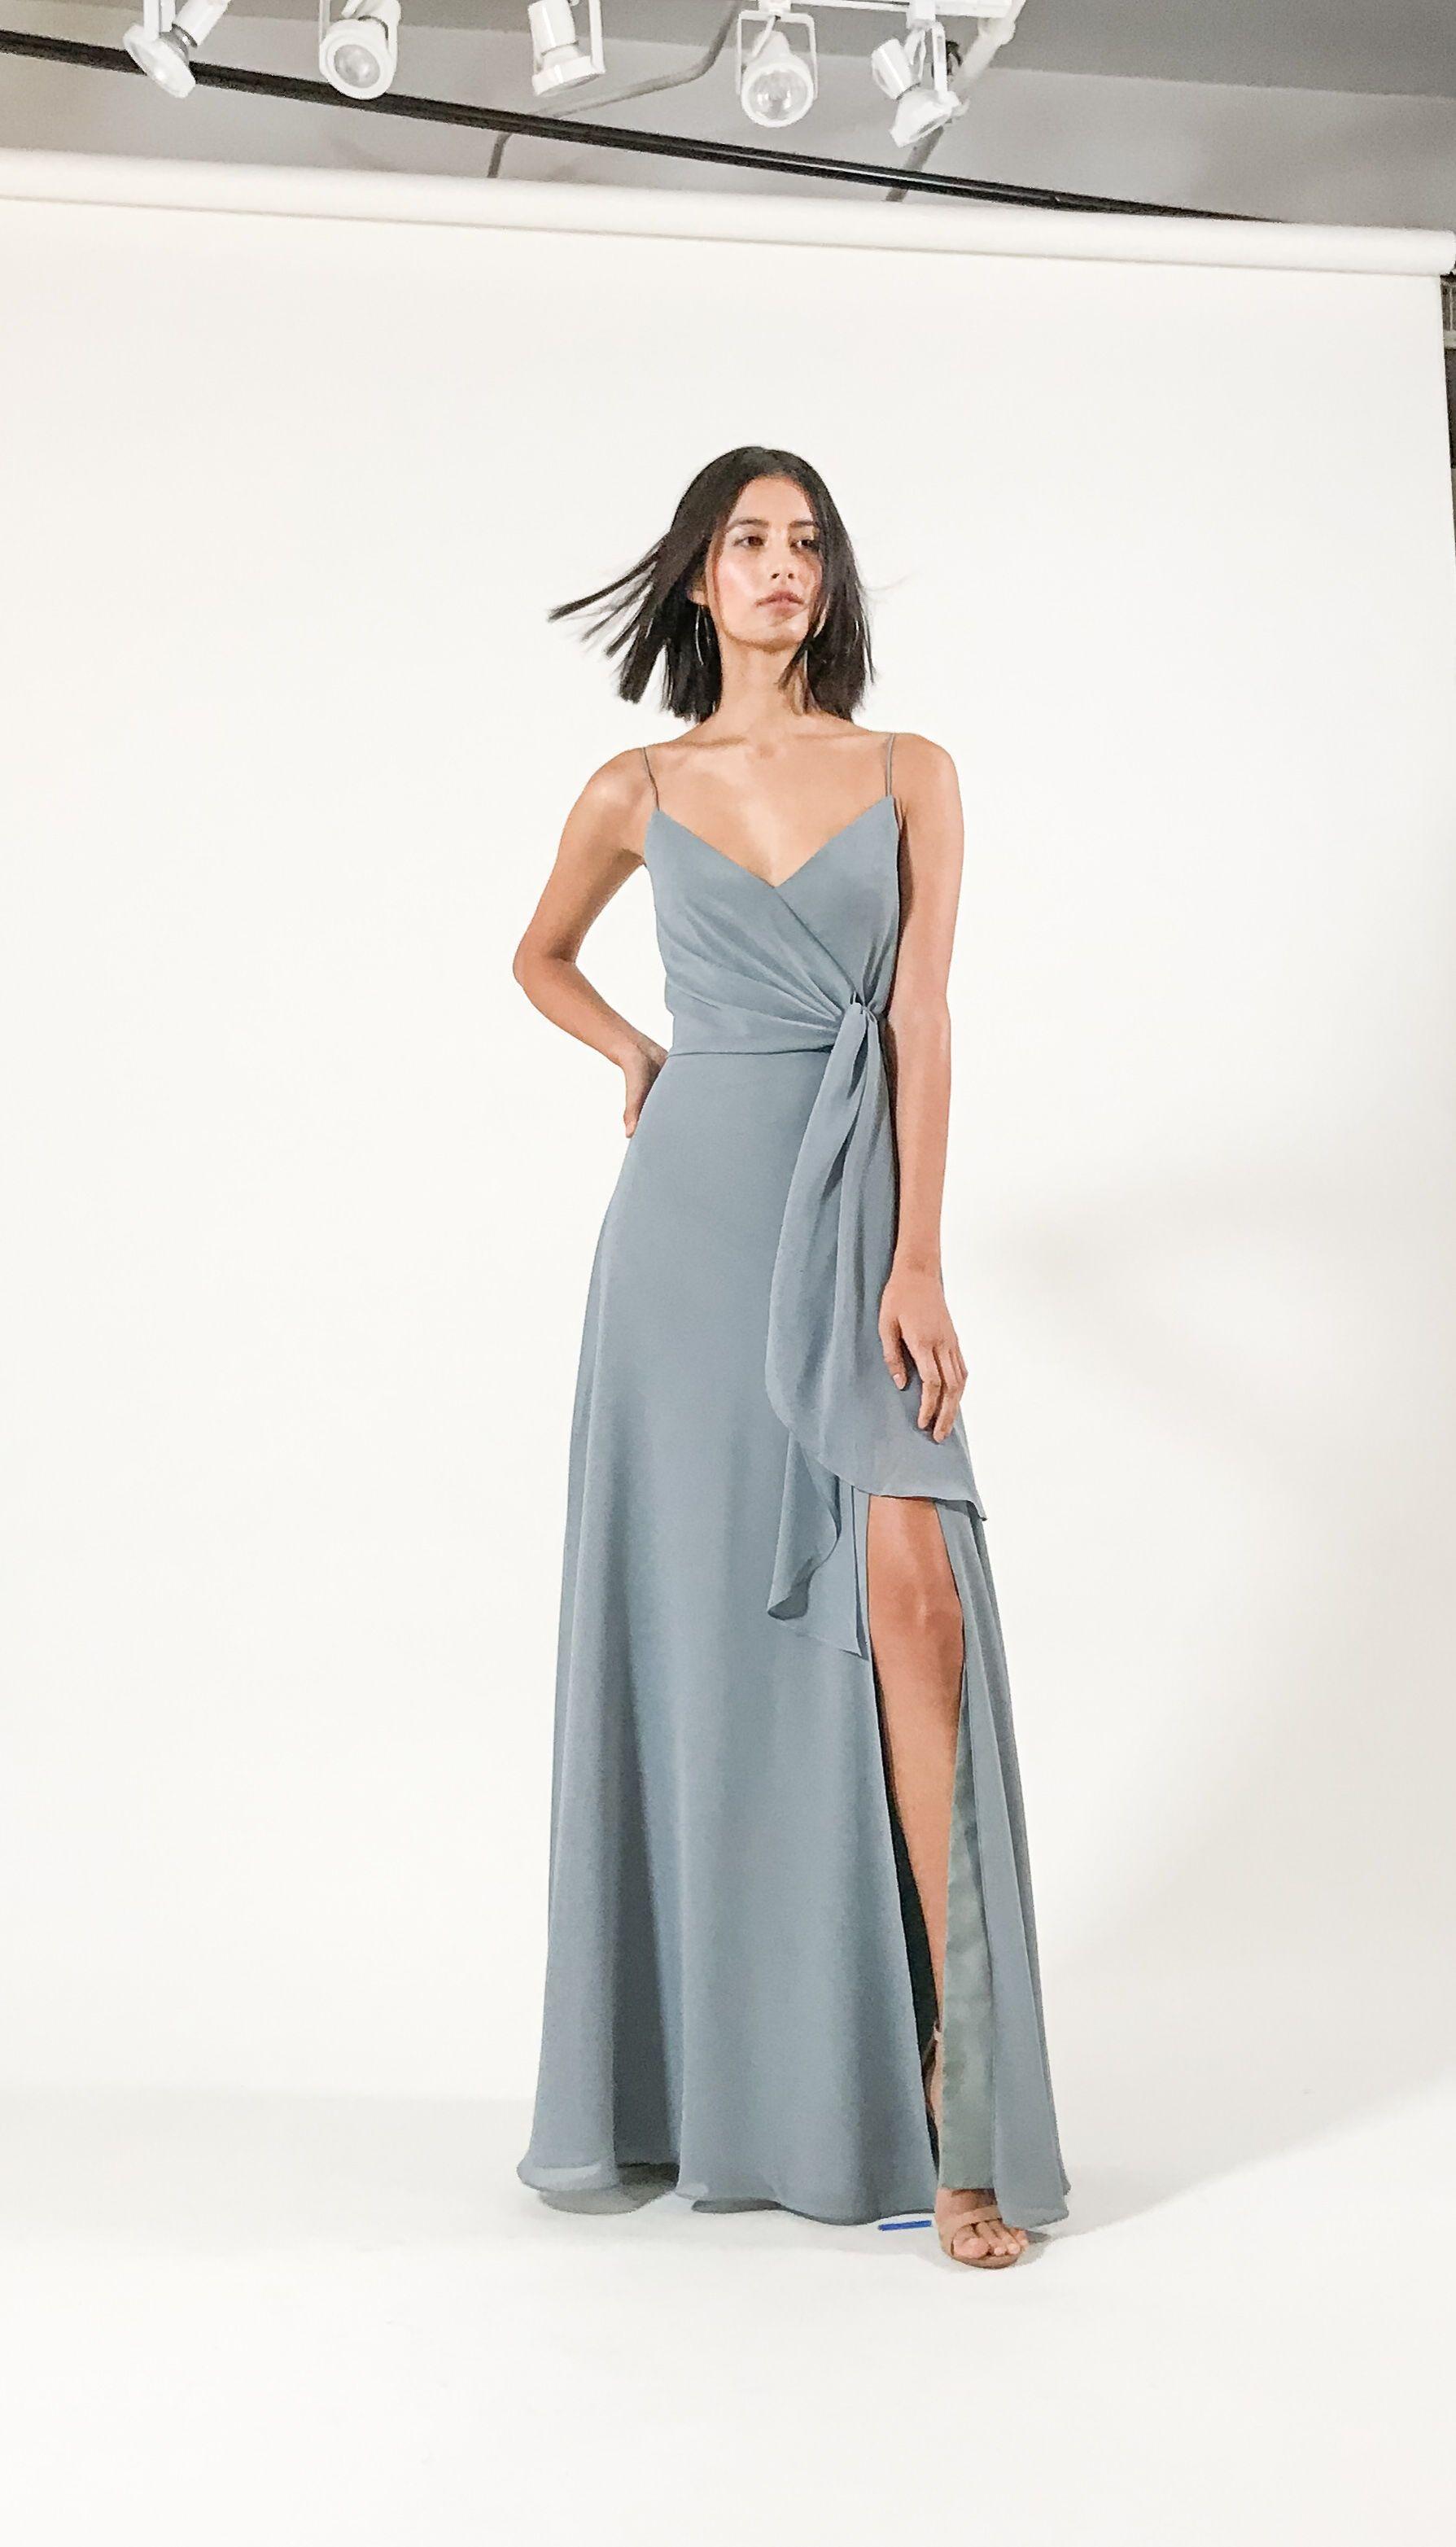 Who Doesn T Love A Good Wrap Dress The Amara Dress By Jenny Yoo 2019 Has A Sophisticated A Line Silhouette Wit Dresses Wedding Dress Flowy Wedding Guest Dress [ 3129 x 1789 Pixel ]